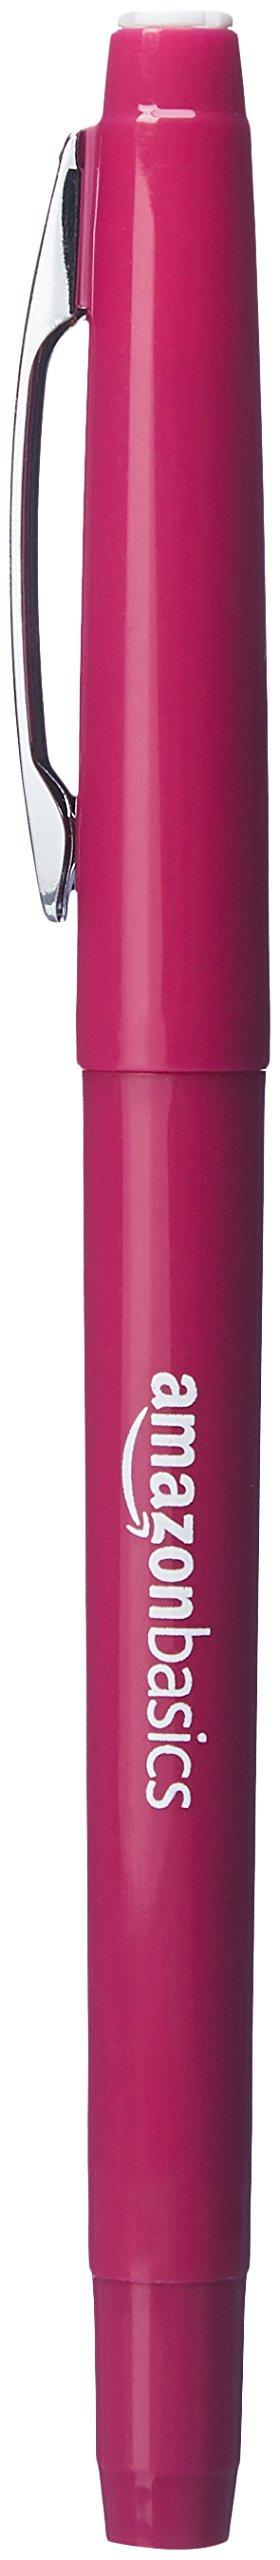 AmazonBasics Felt Tip Marker Pens - Assorted Color, 24-Pack by AmazonBasics (Image #6)